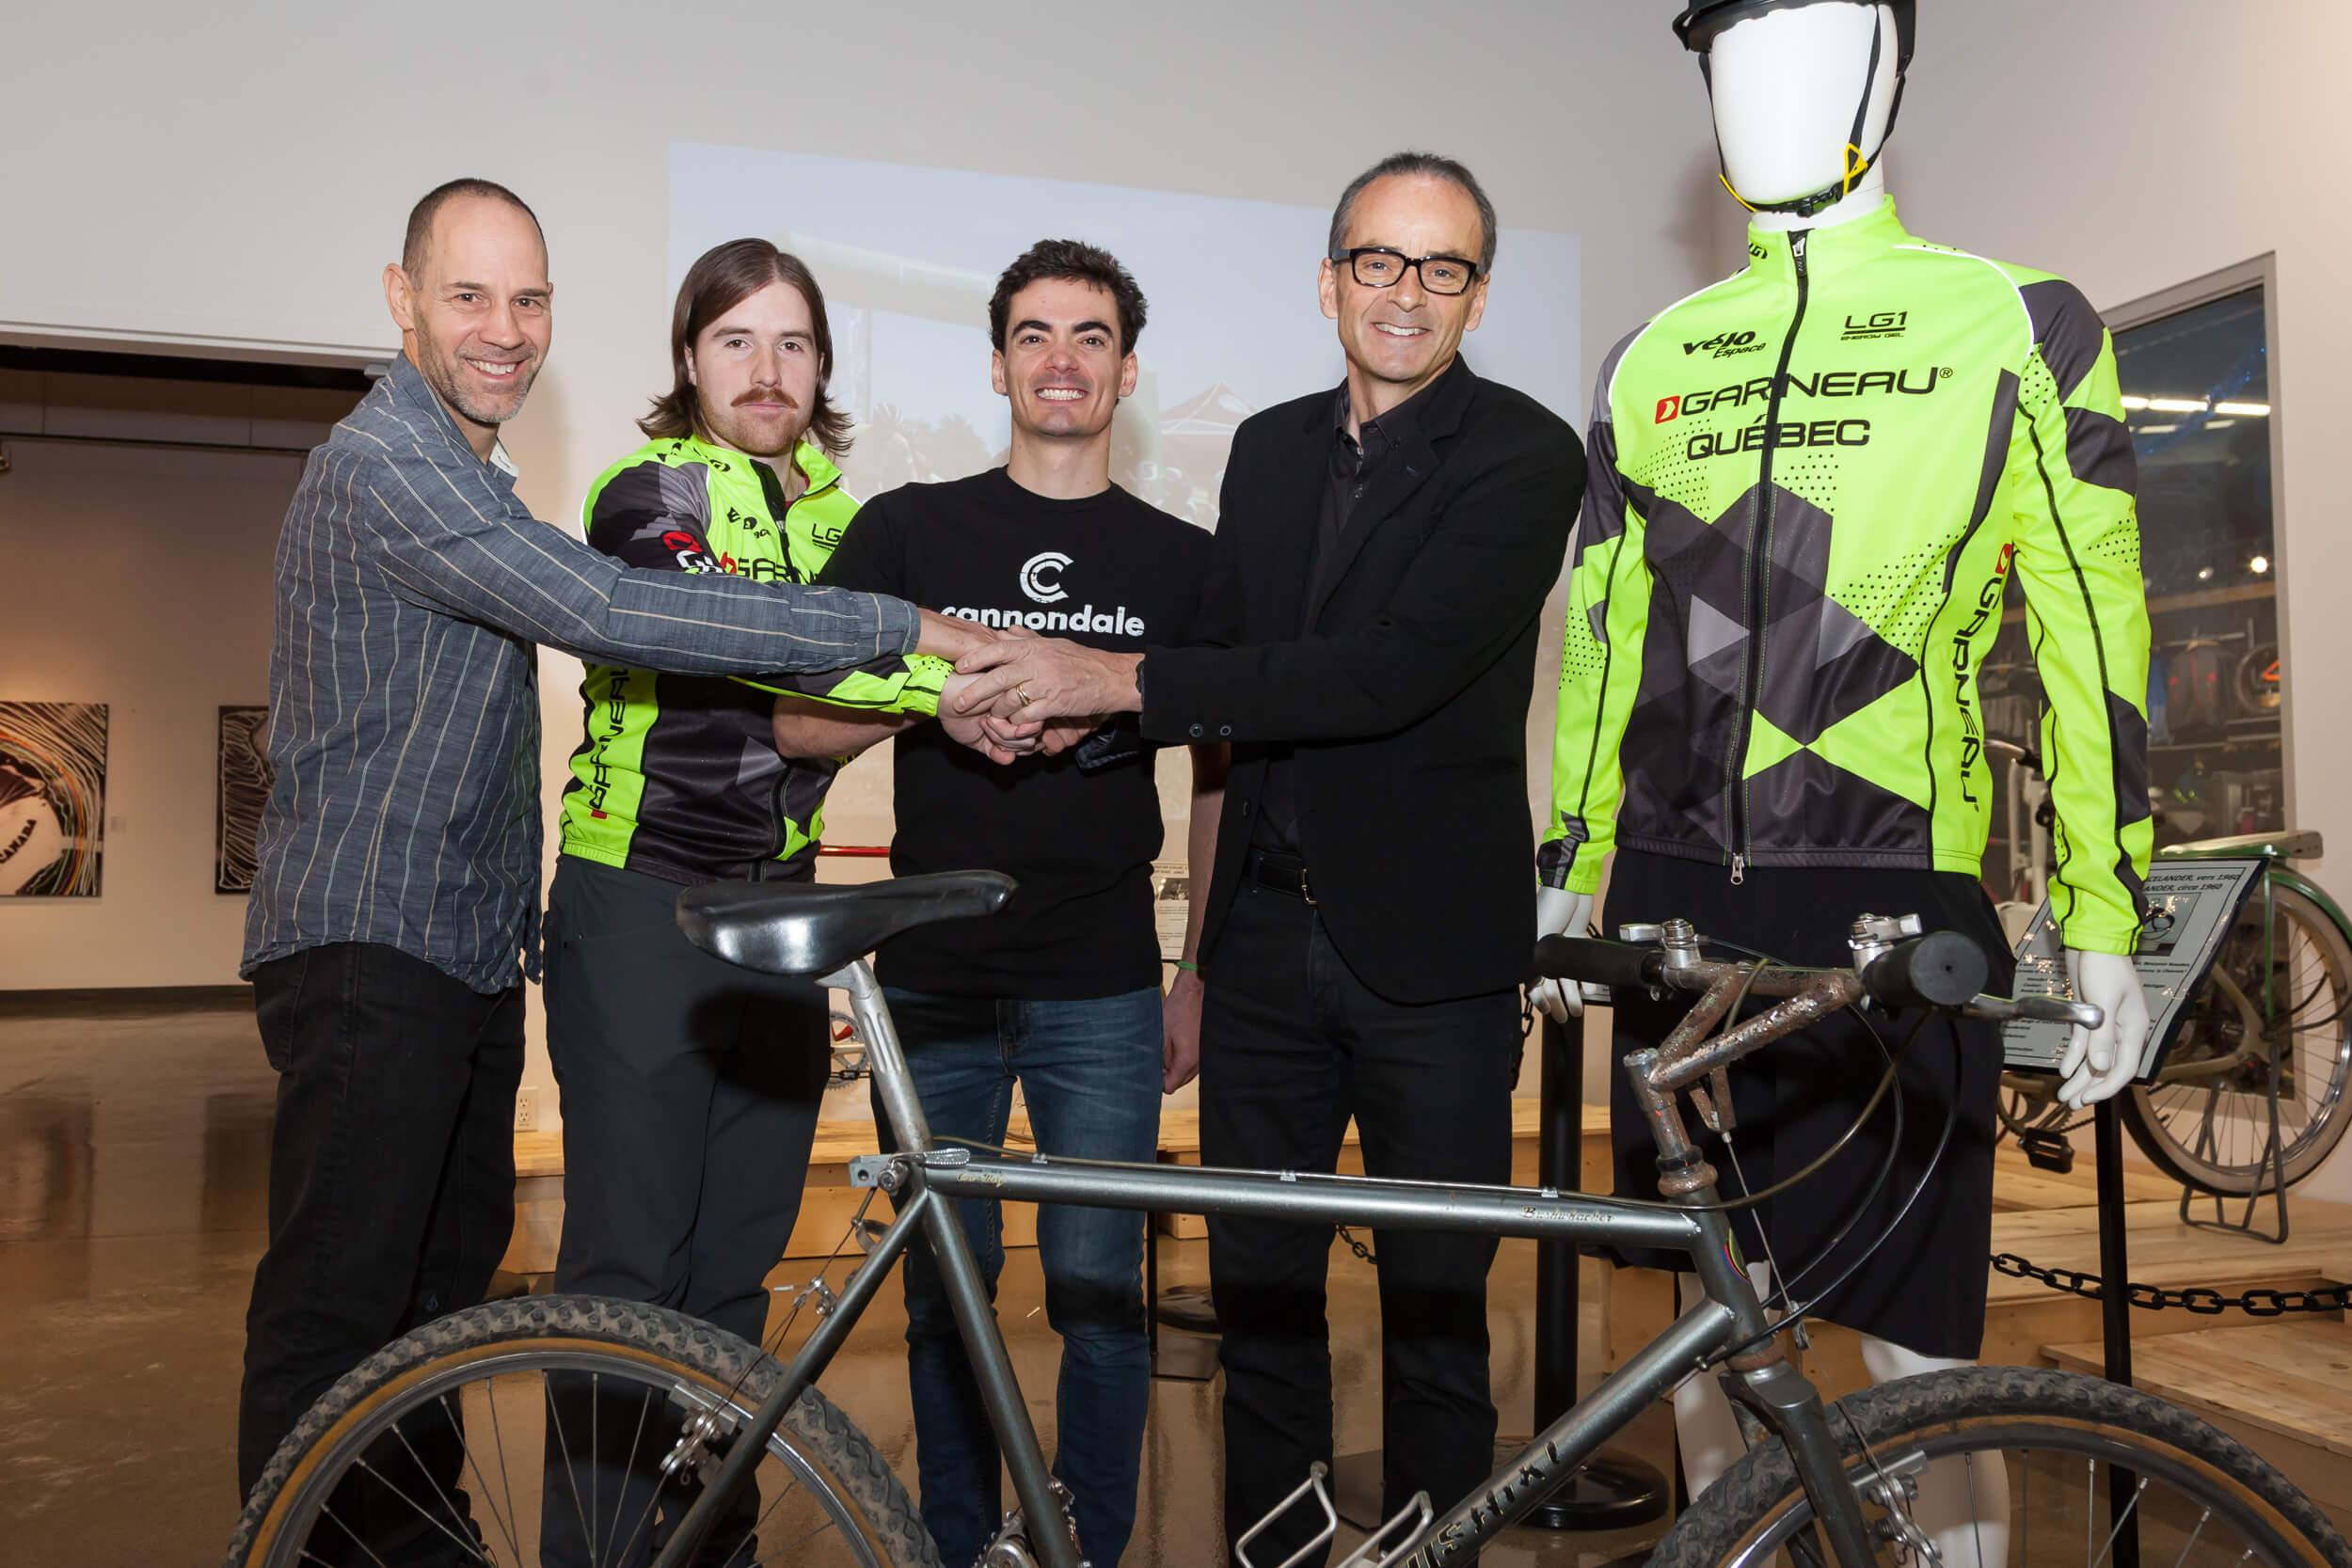 Club de vélo de montagne garneau, louis garneau